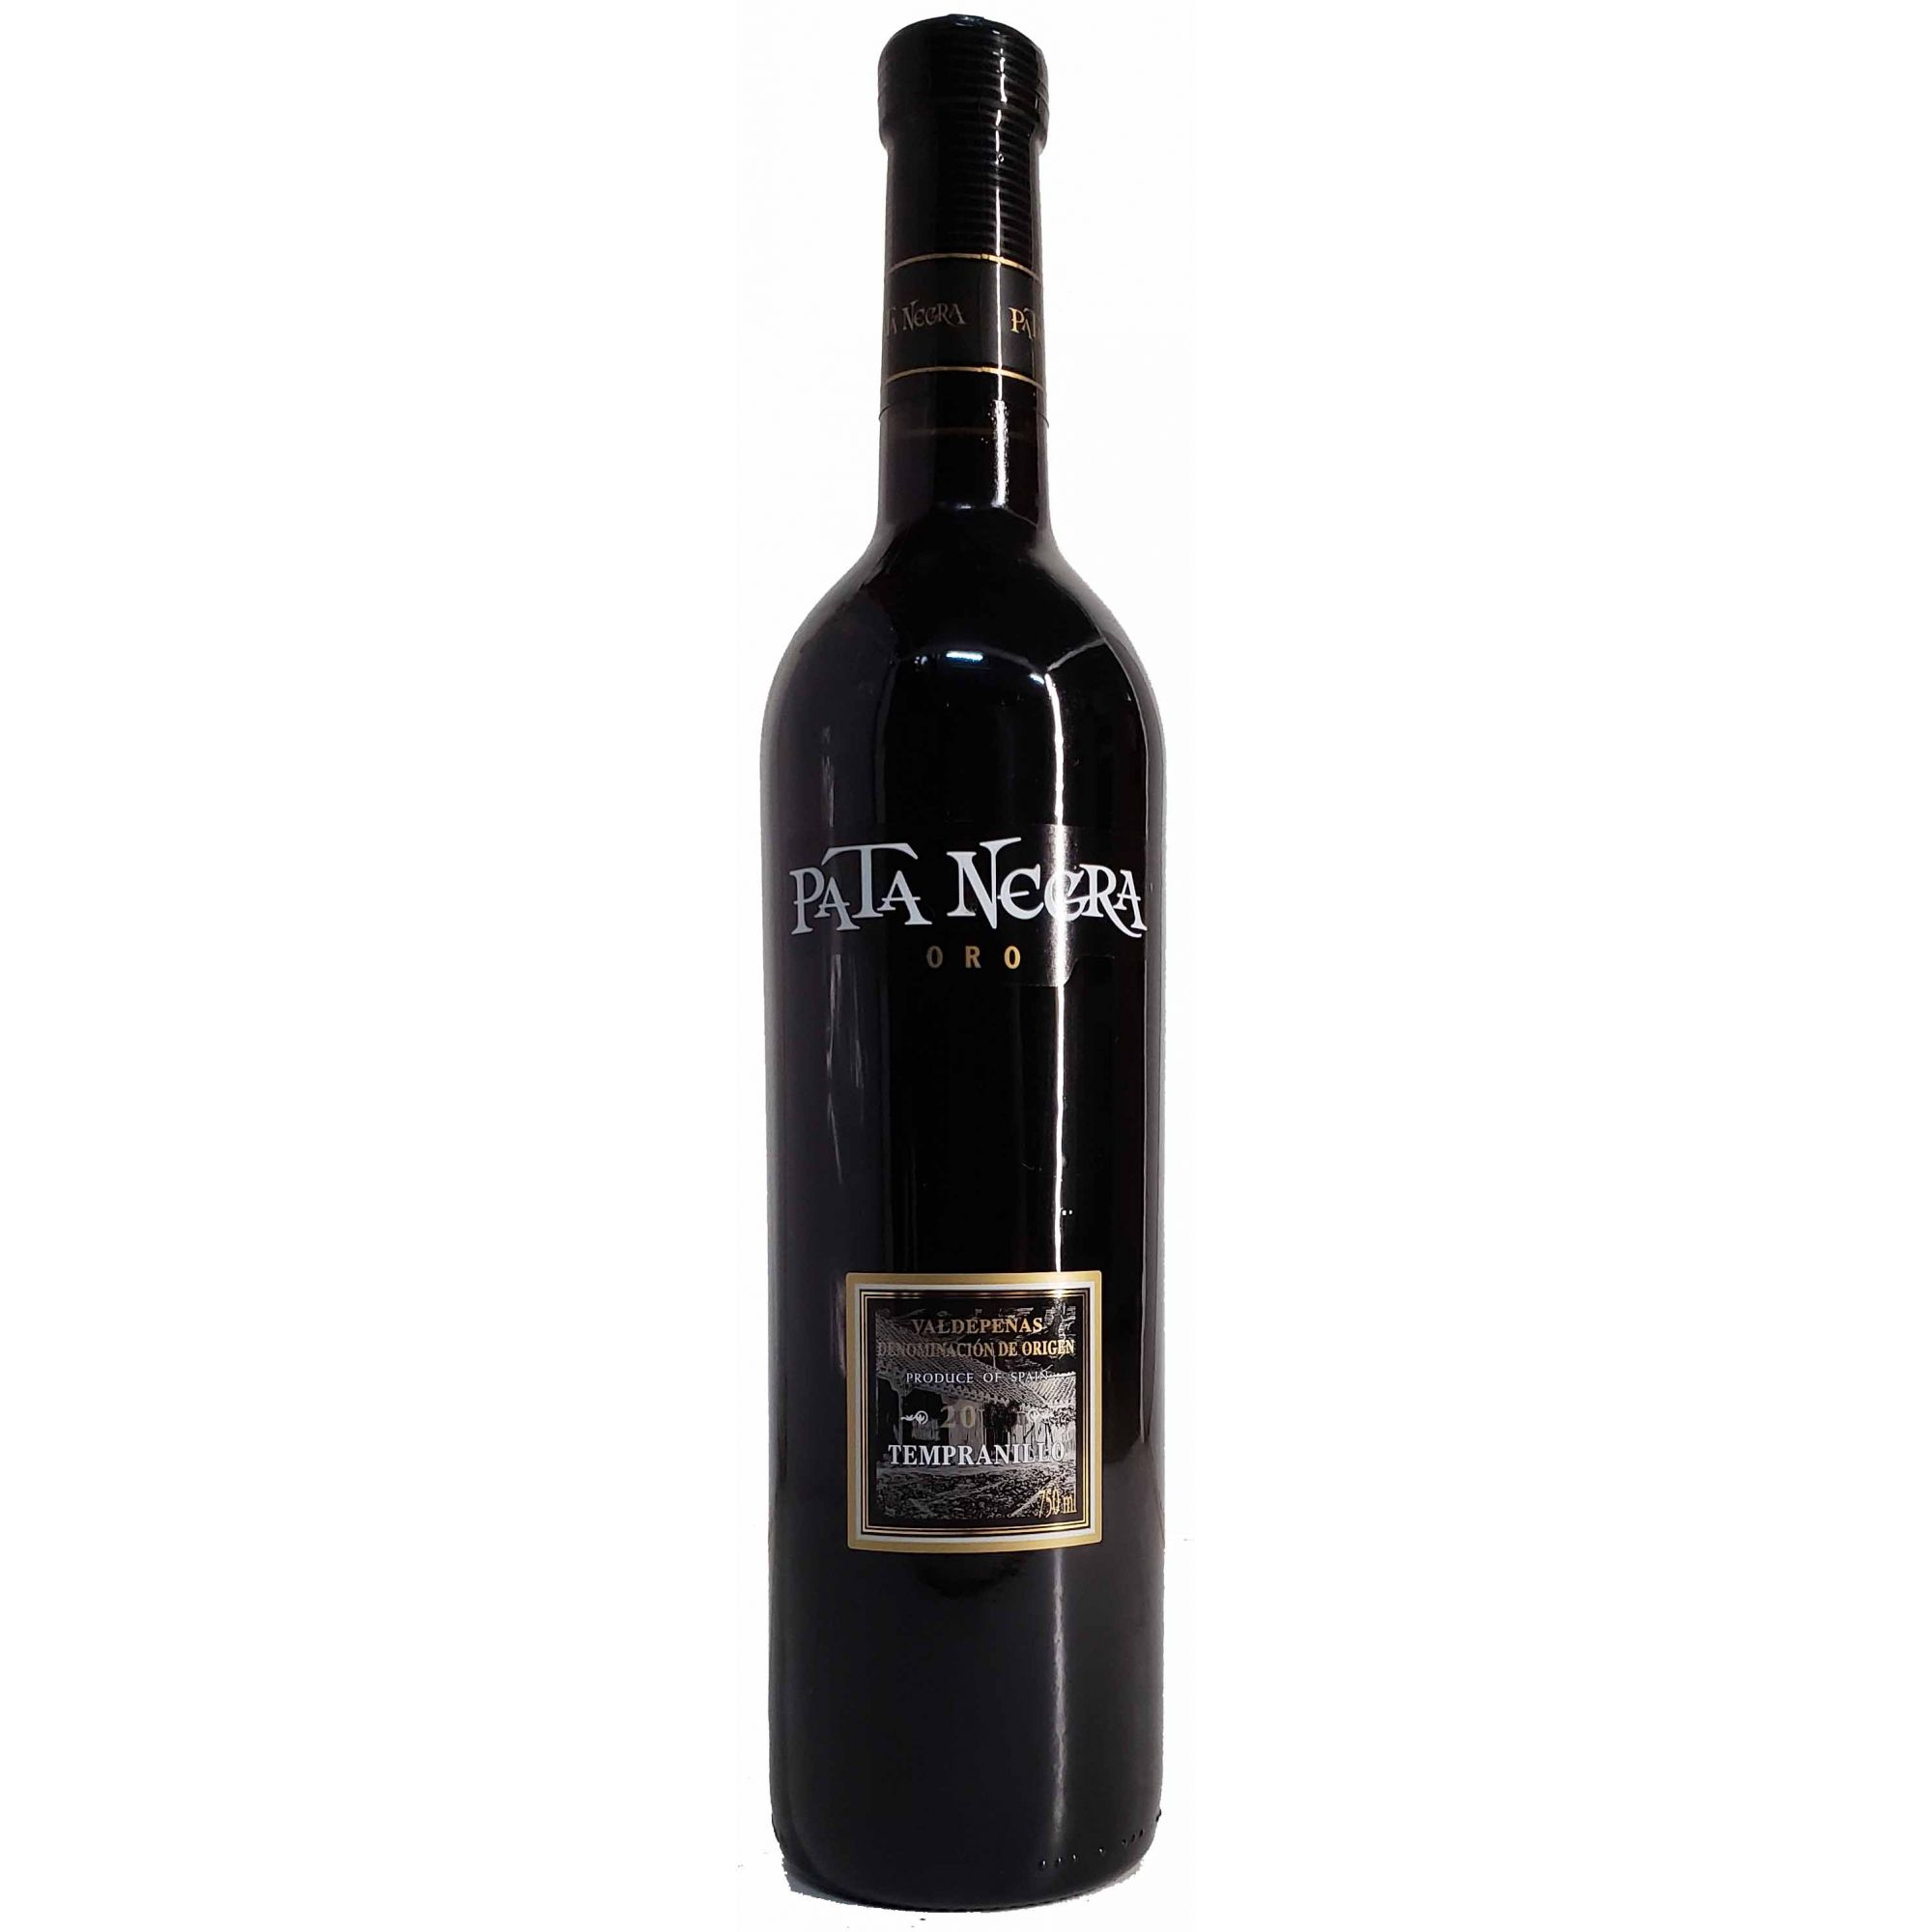 Vinho Tinto Pata Negra Oro Tempranillo Valdepenas DO - 750ml -